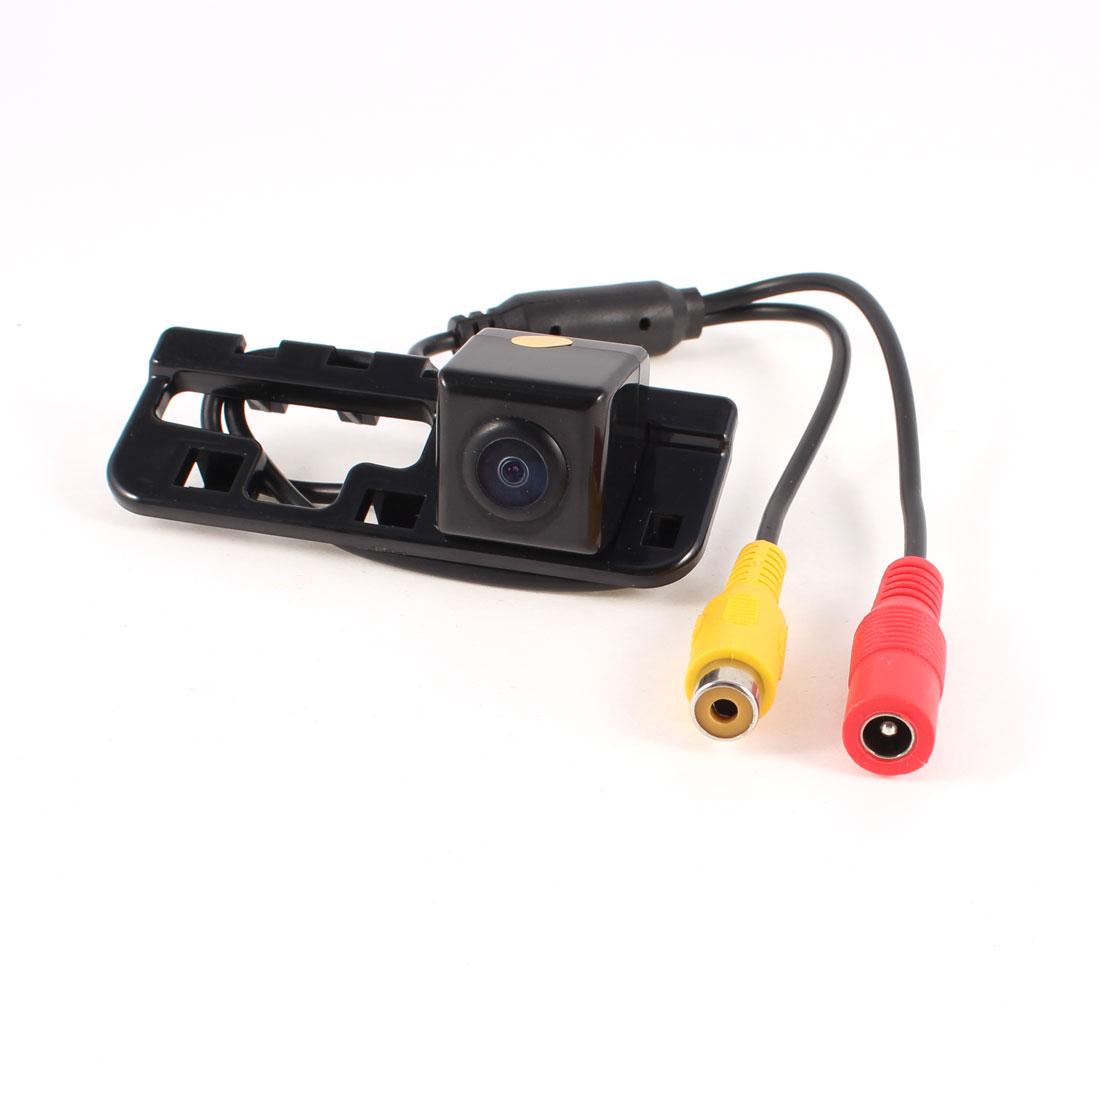 Universal Color Image NTSC Cars Auto Rear View Camera 170 Degree Angle